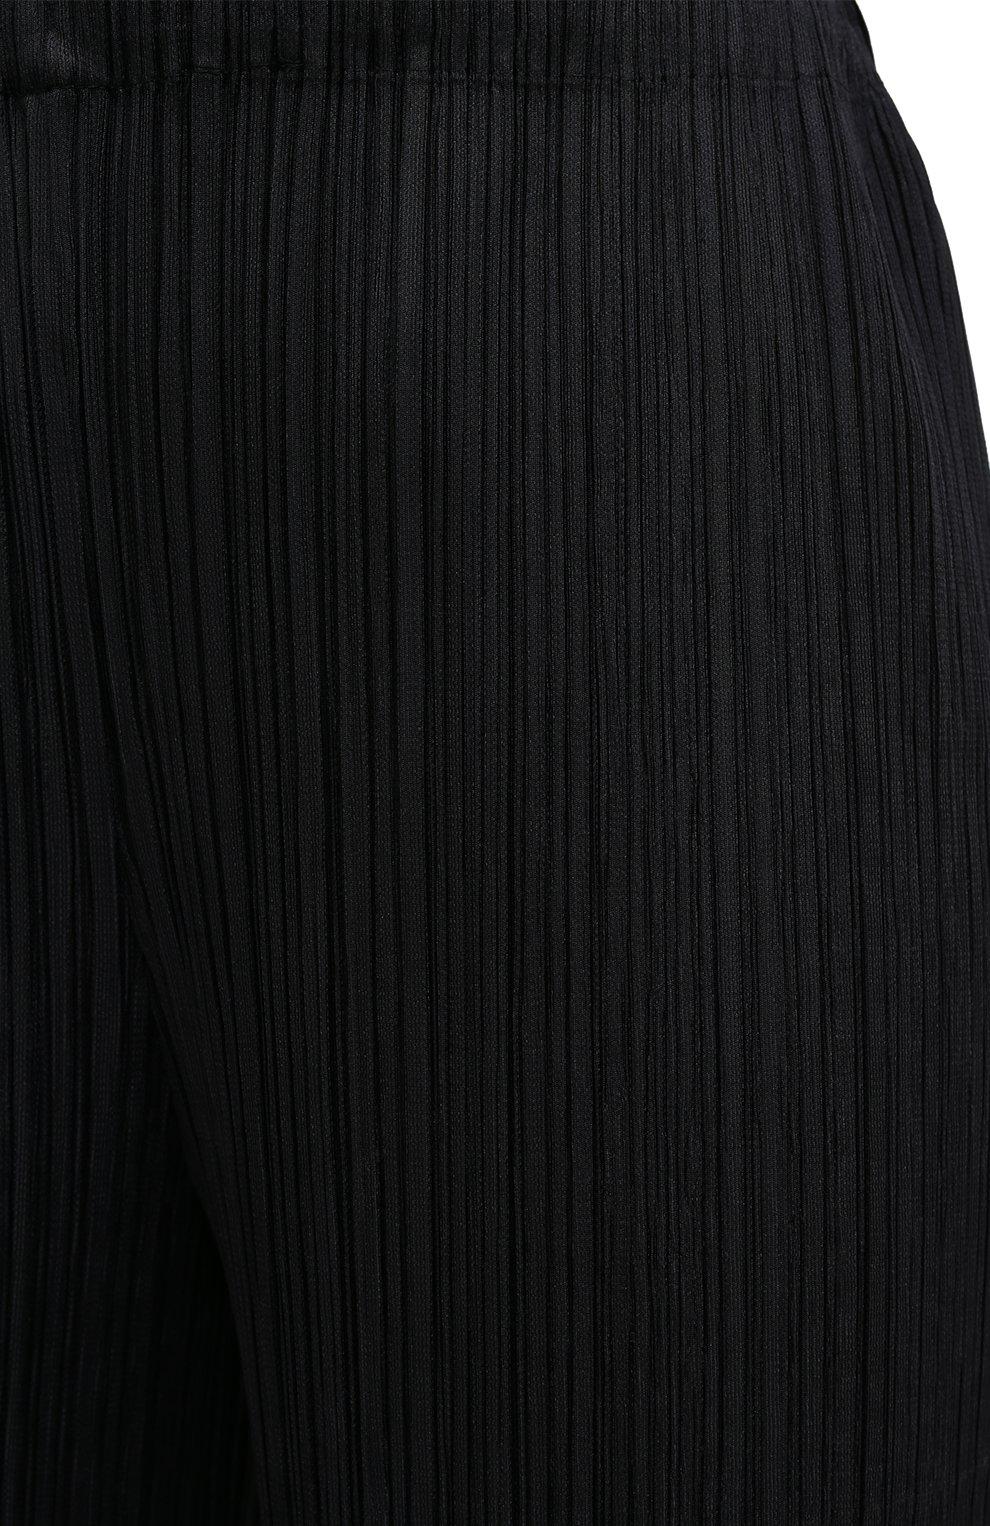 Женские брюки ISSEY MIYAKE черного цвета, арт. PP08-JF412 | Фото 5